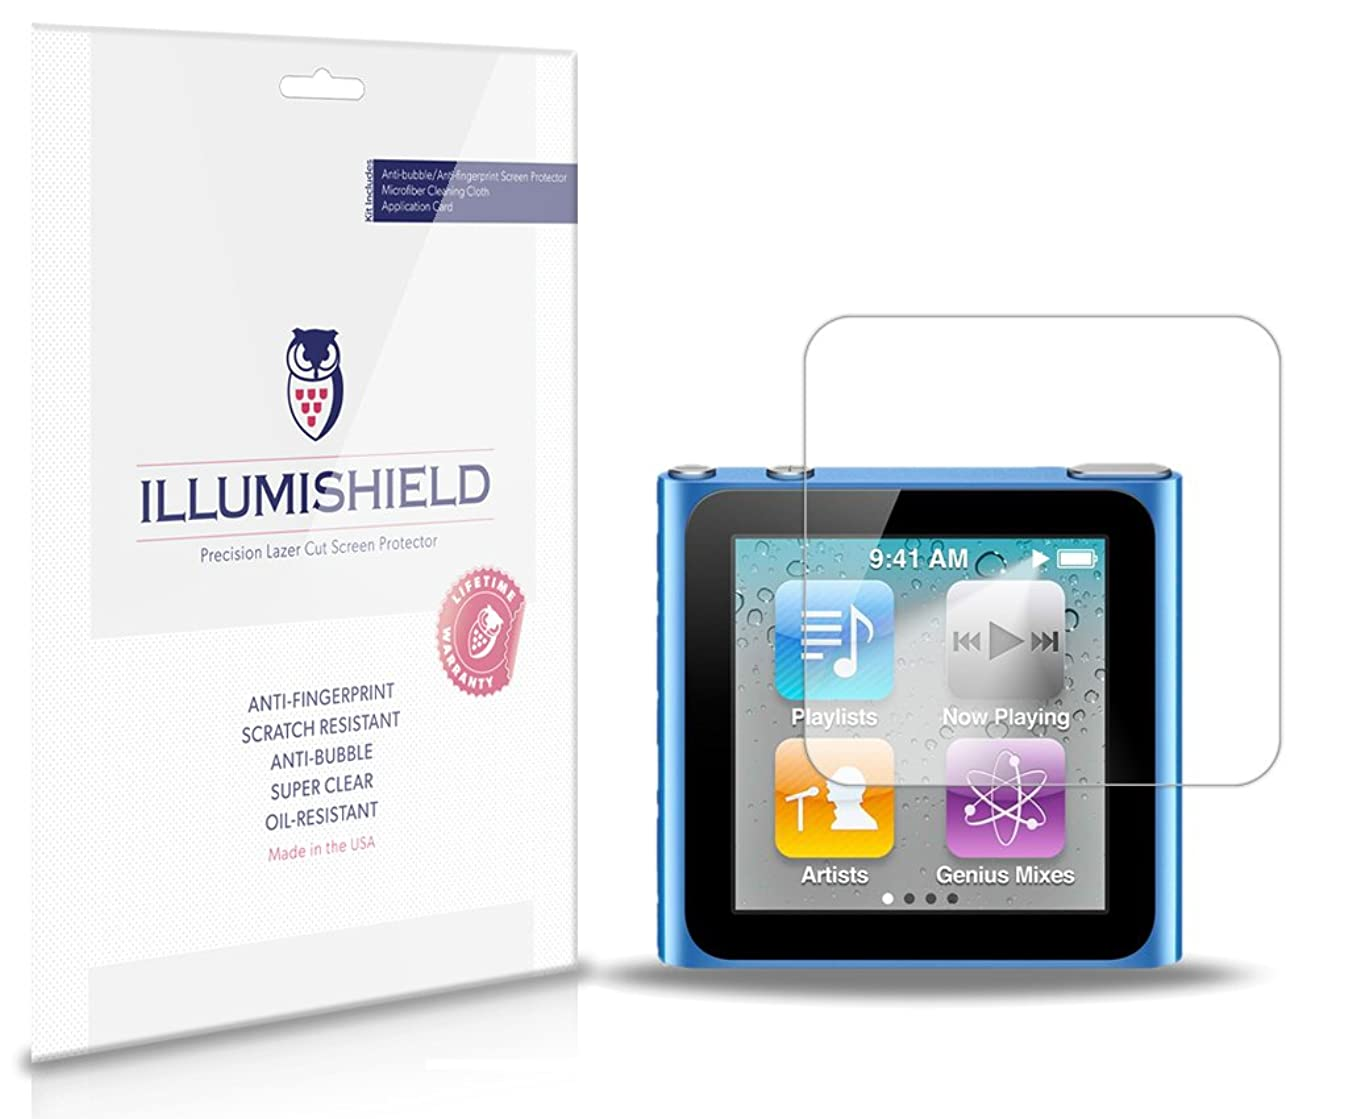 Apple iPod nano 6 Screen Protector (6th Gen)[3-Pack], iLLumiShield - Japanese Ultra Clear HD Film with Anti-Bubble and Anti-Fingerprint Shield